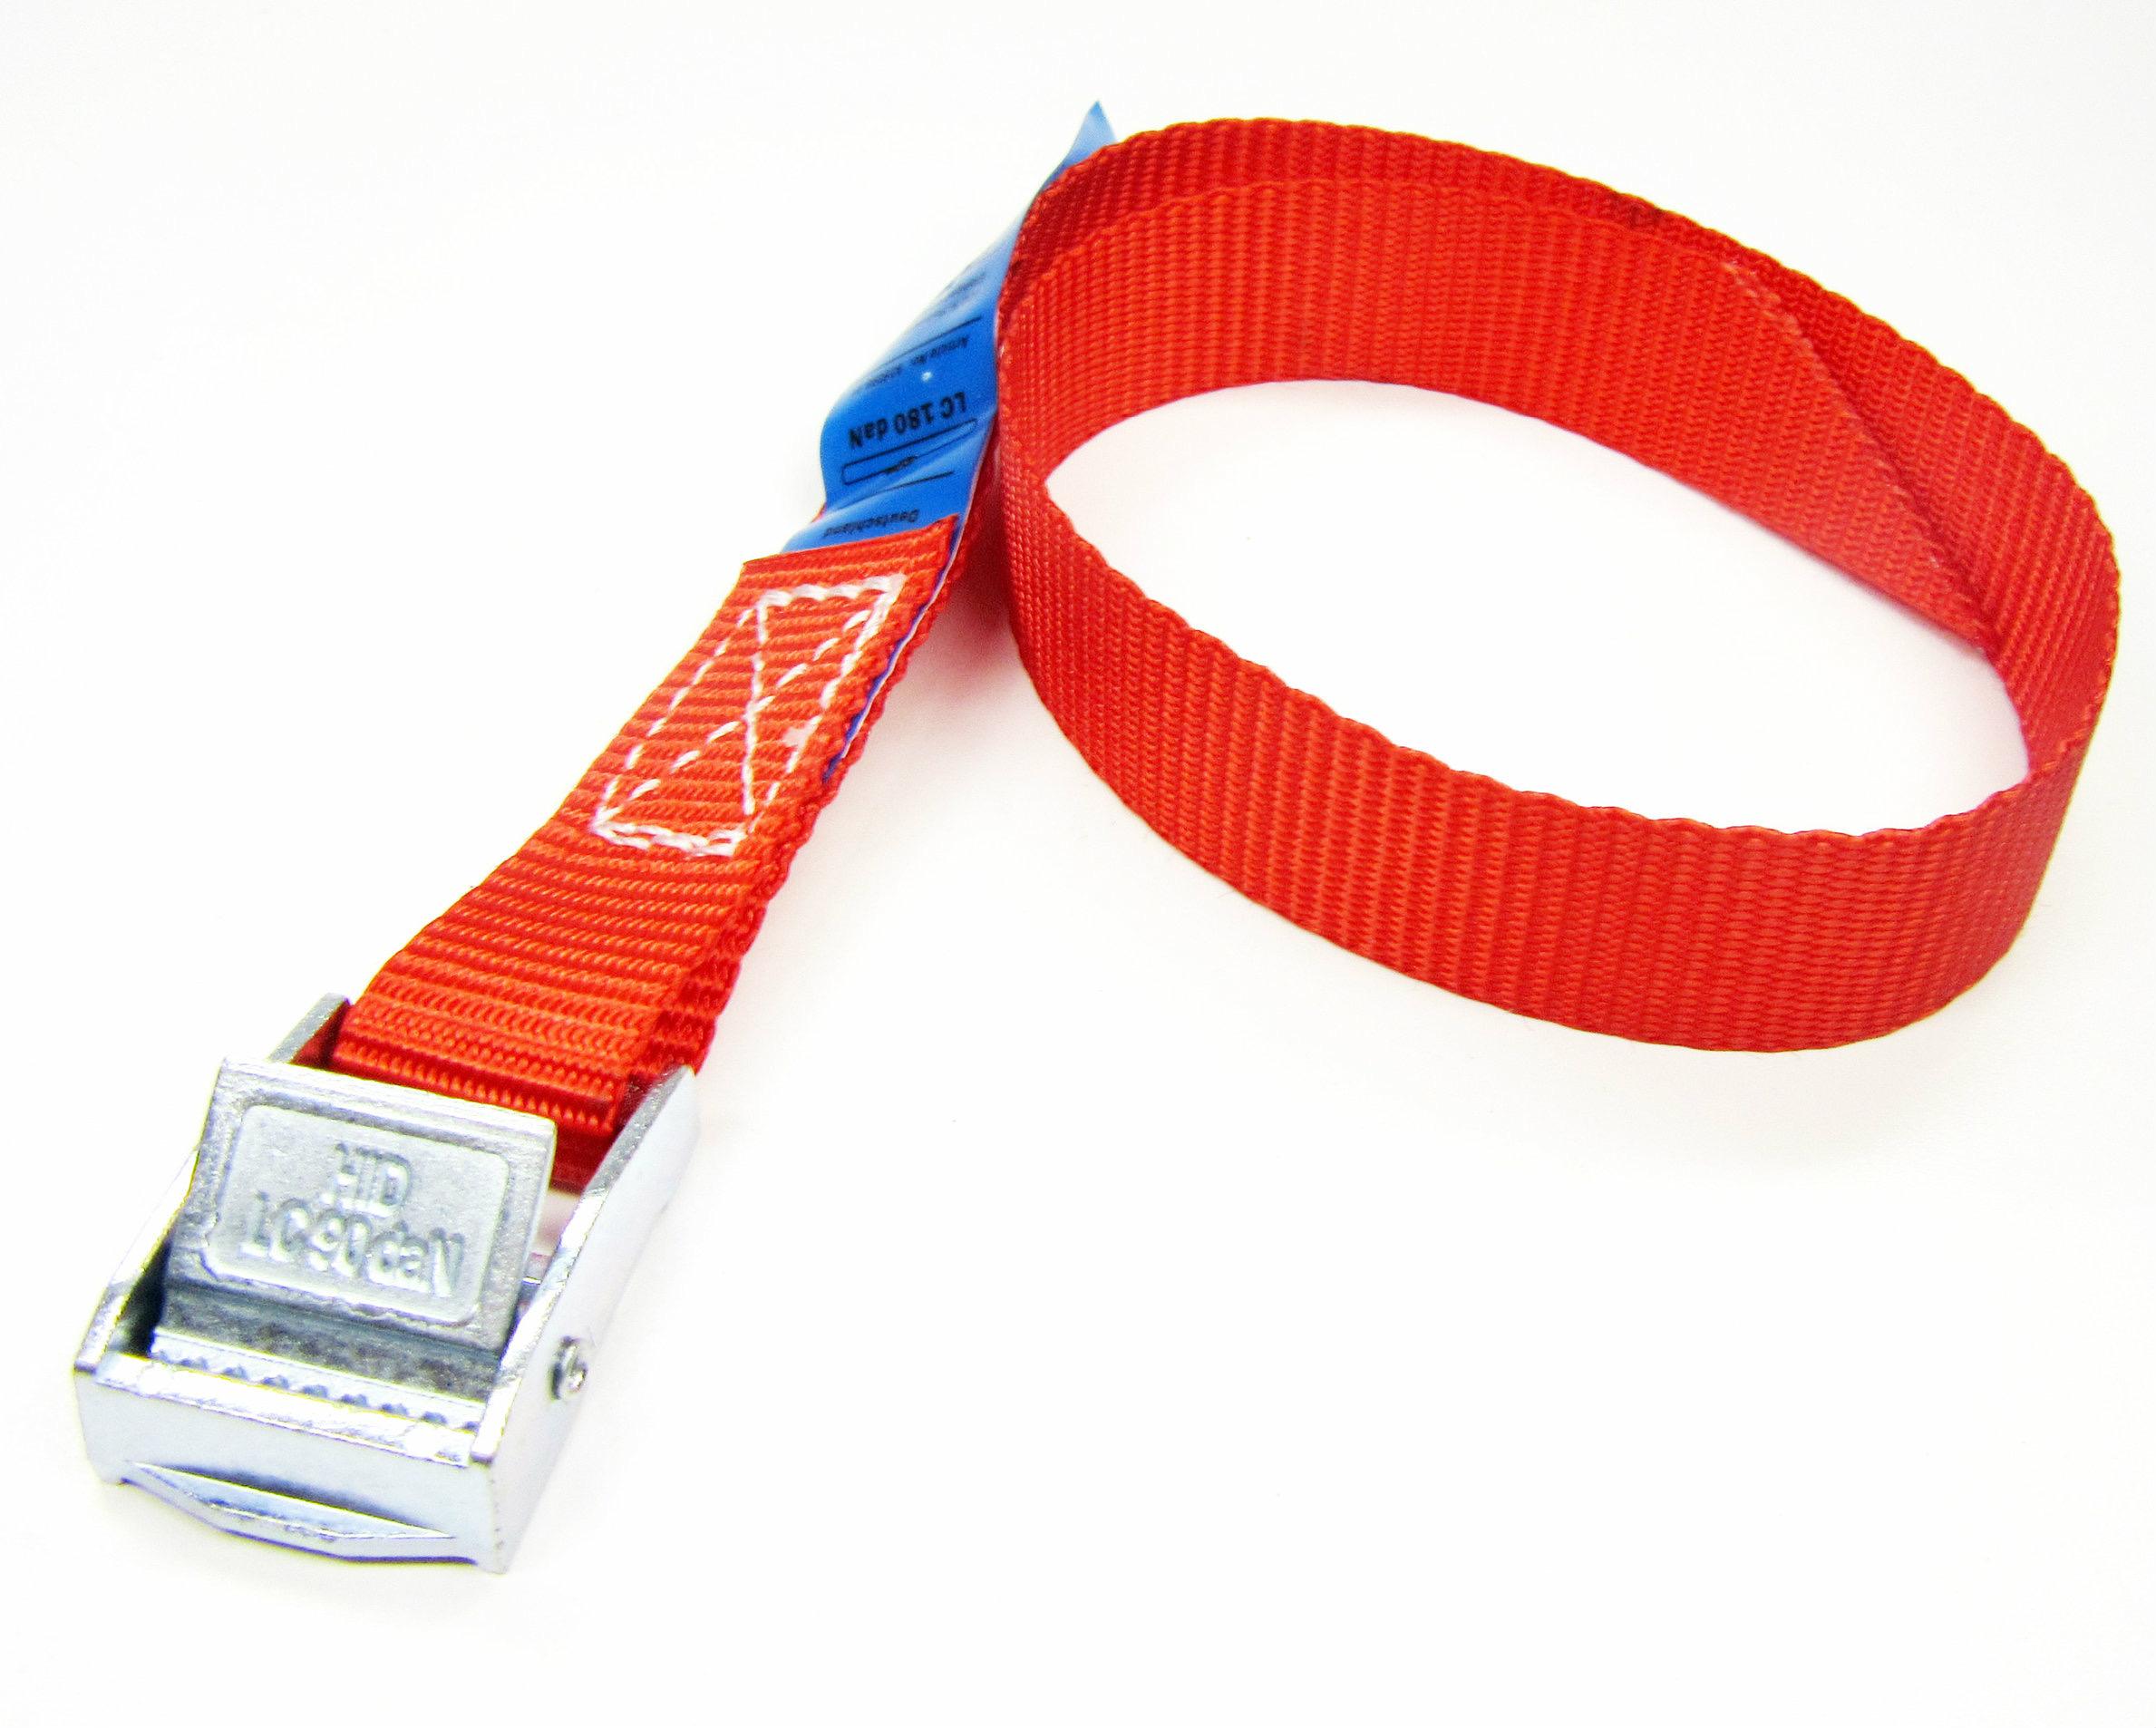 Spanbanden rood 20 mm met klemsluiting